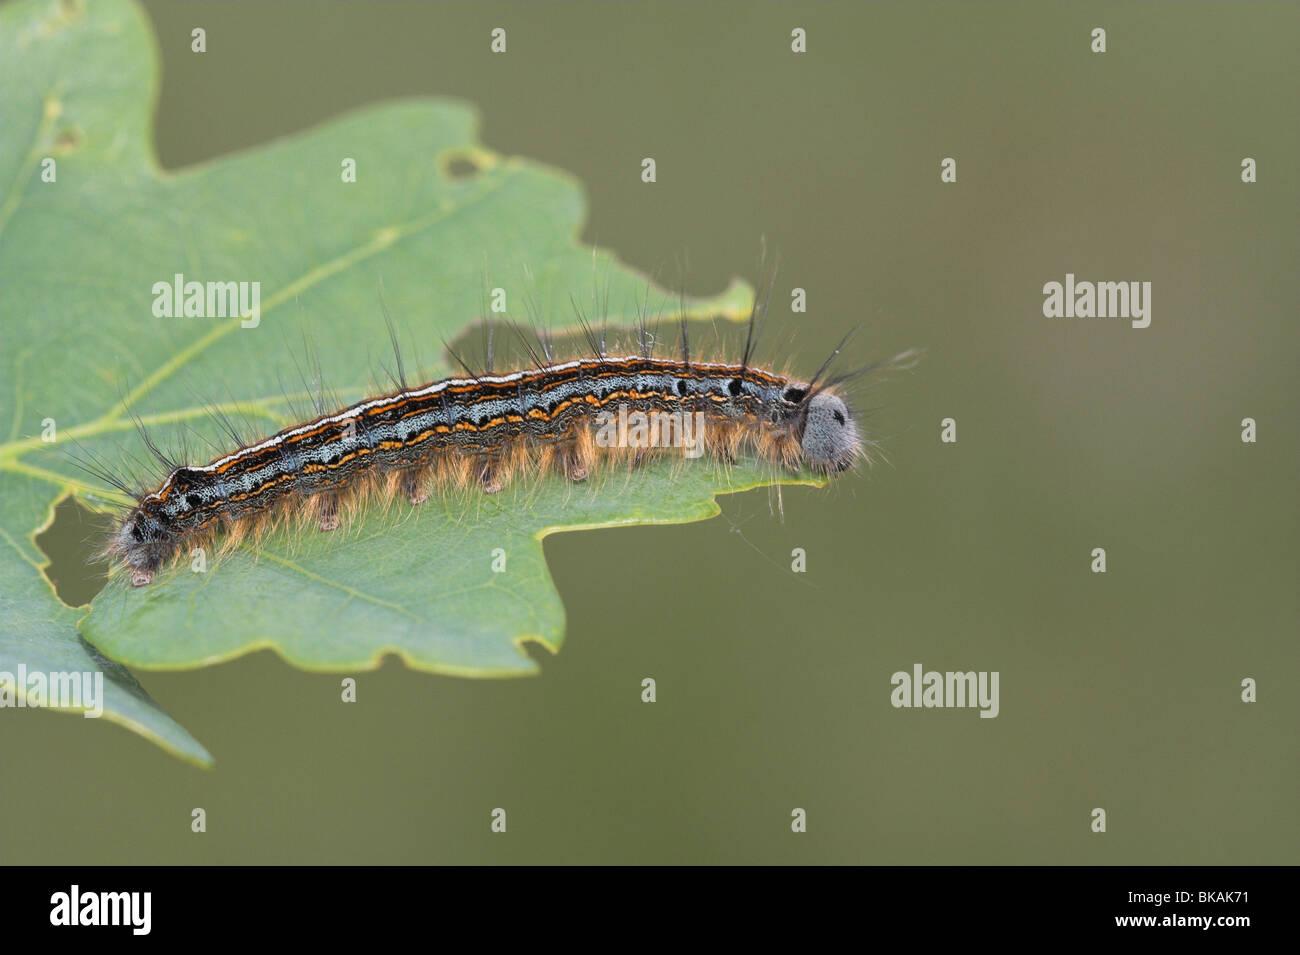 Caterpillar of the Lackey - Stock Image